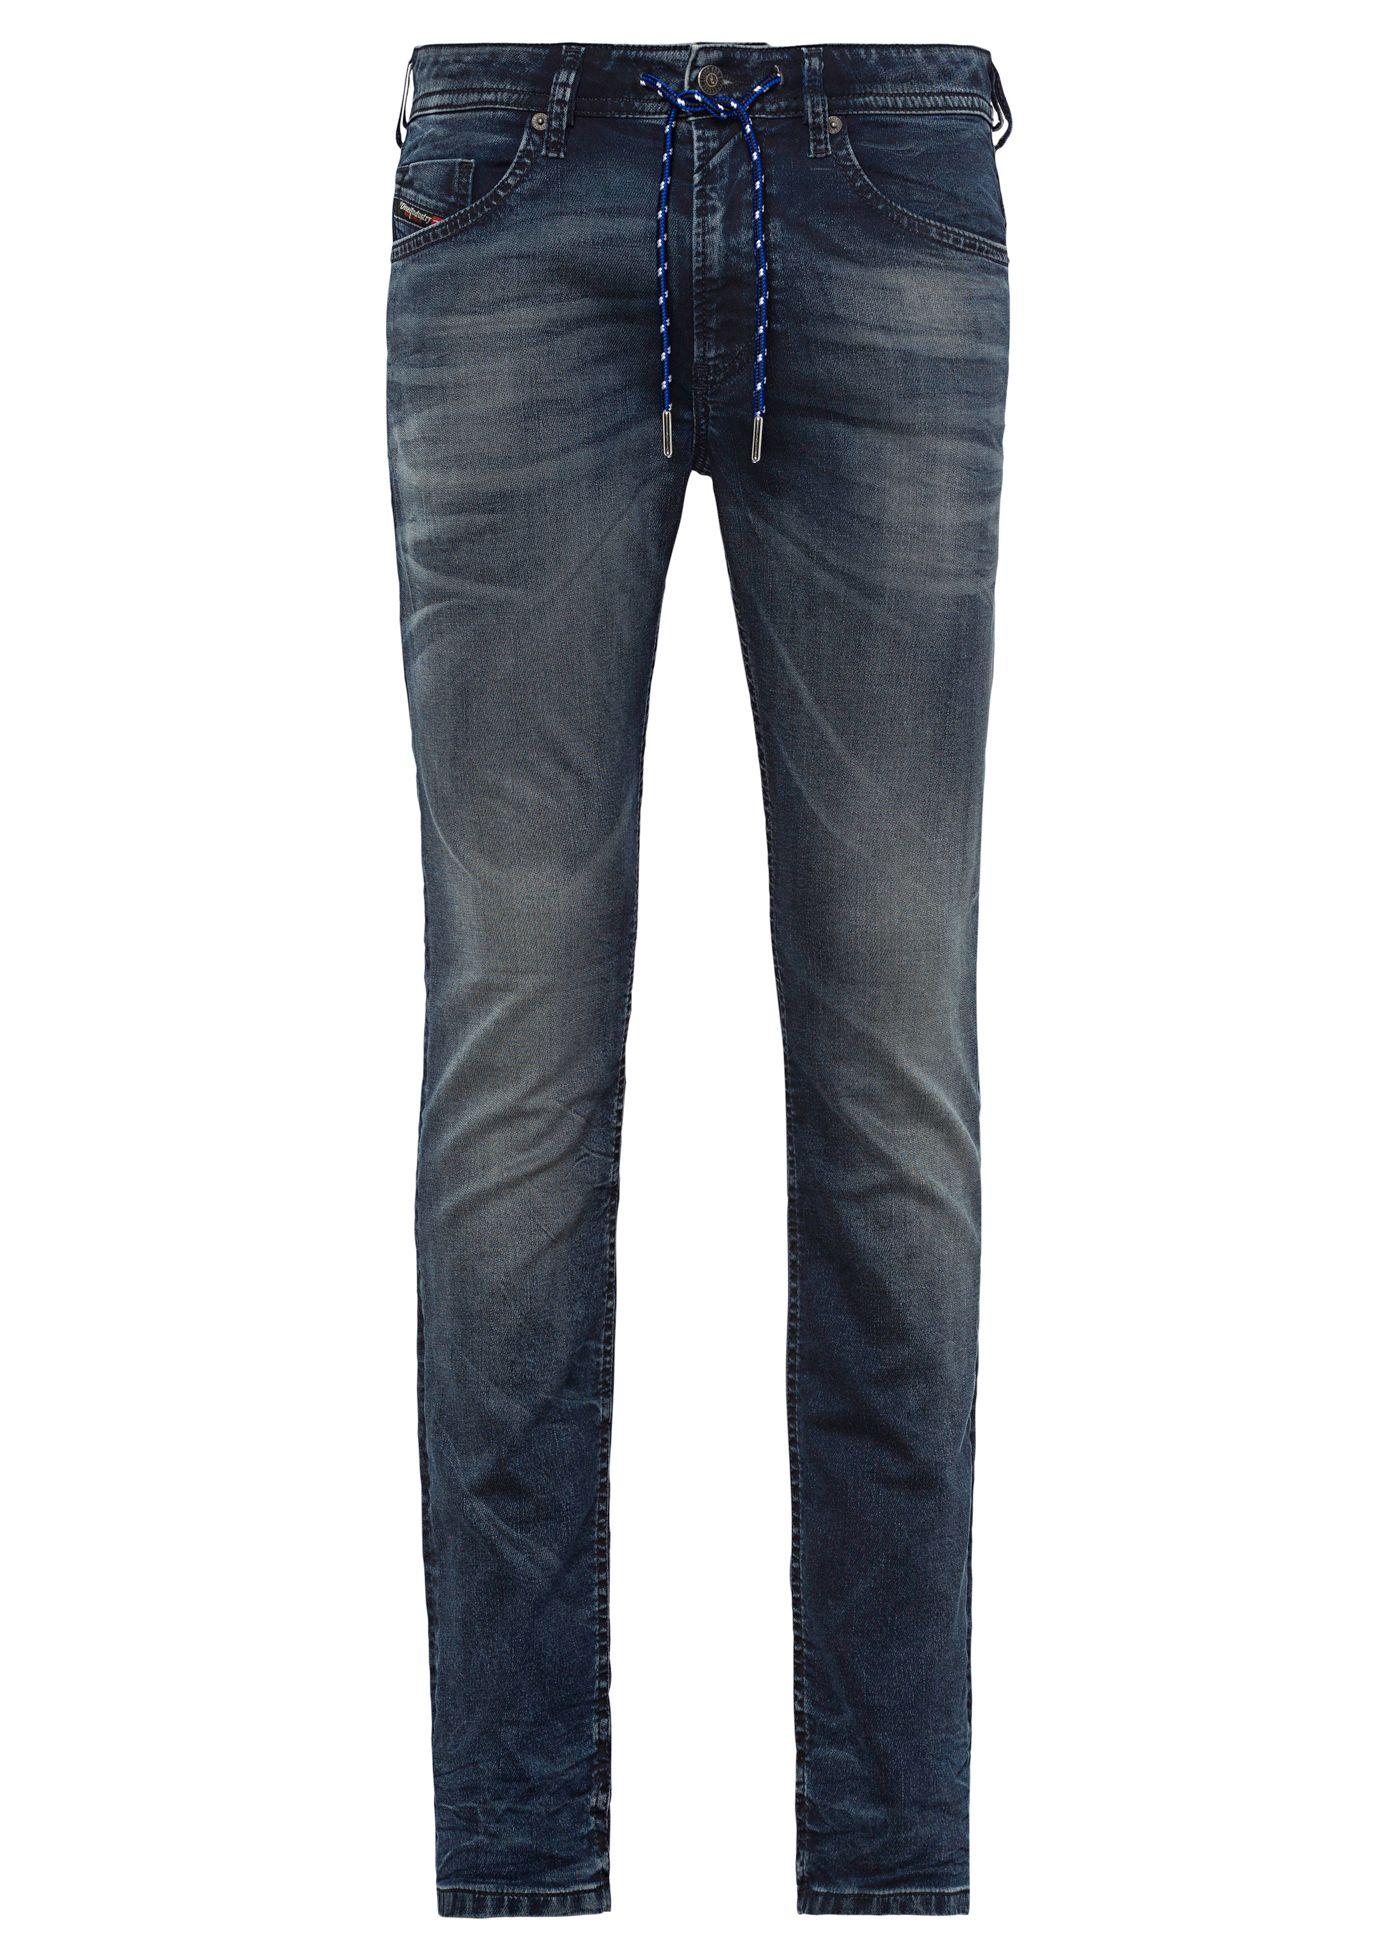 THOMMER-Y-NE L.32 Sweat jeans image number 0